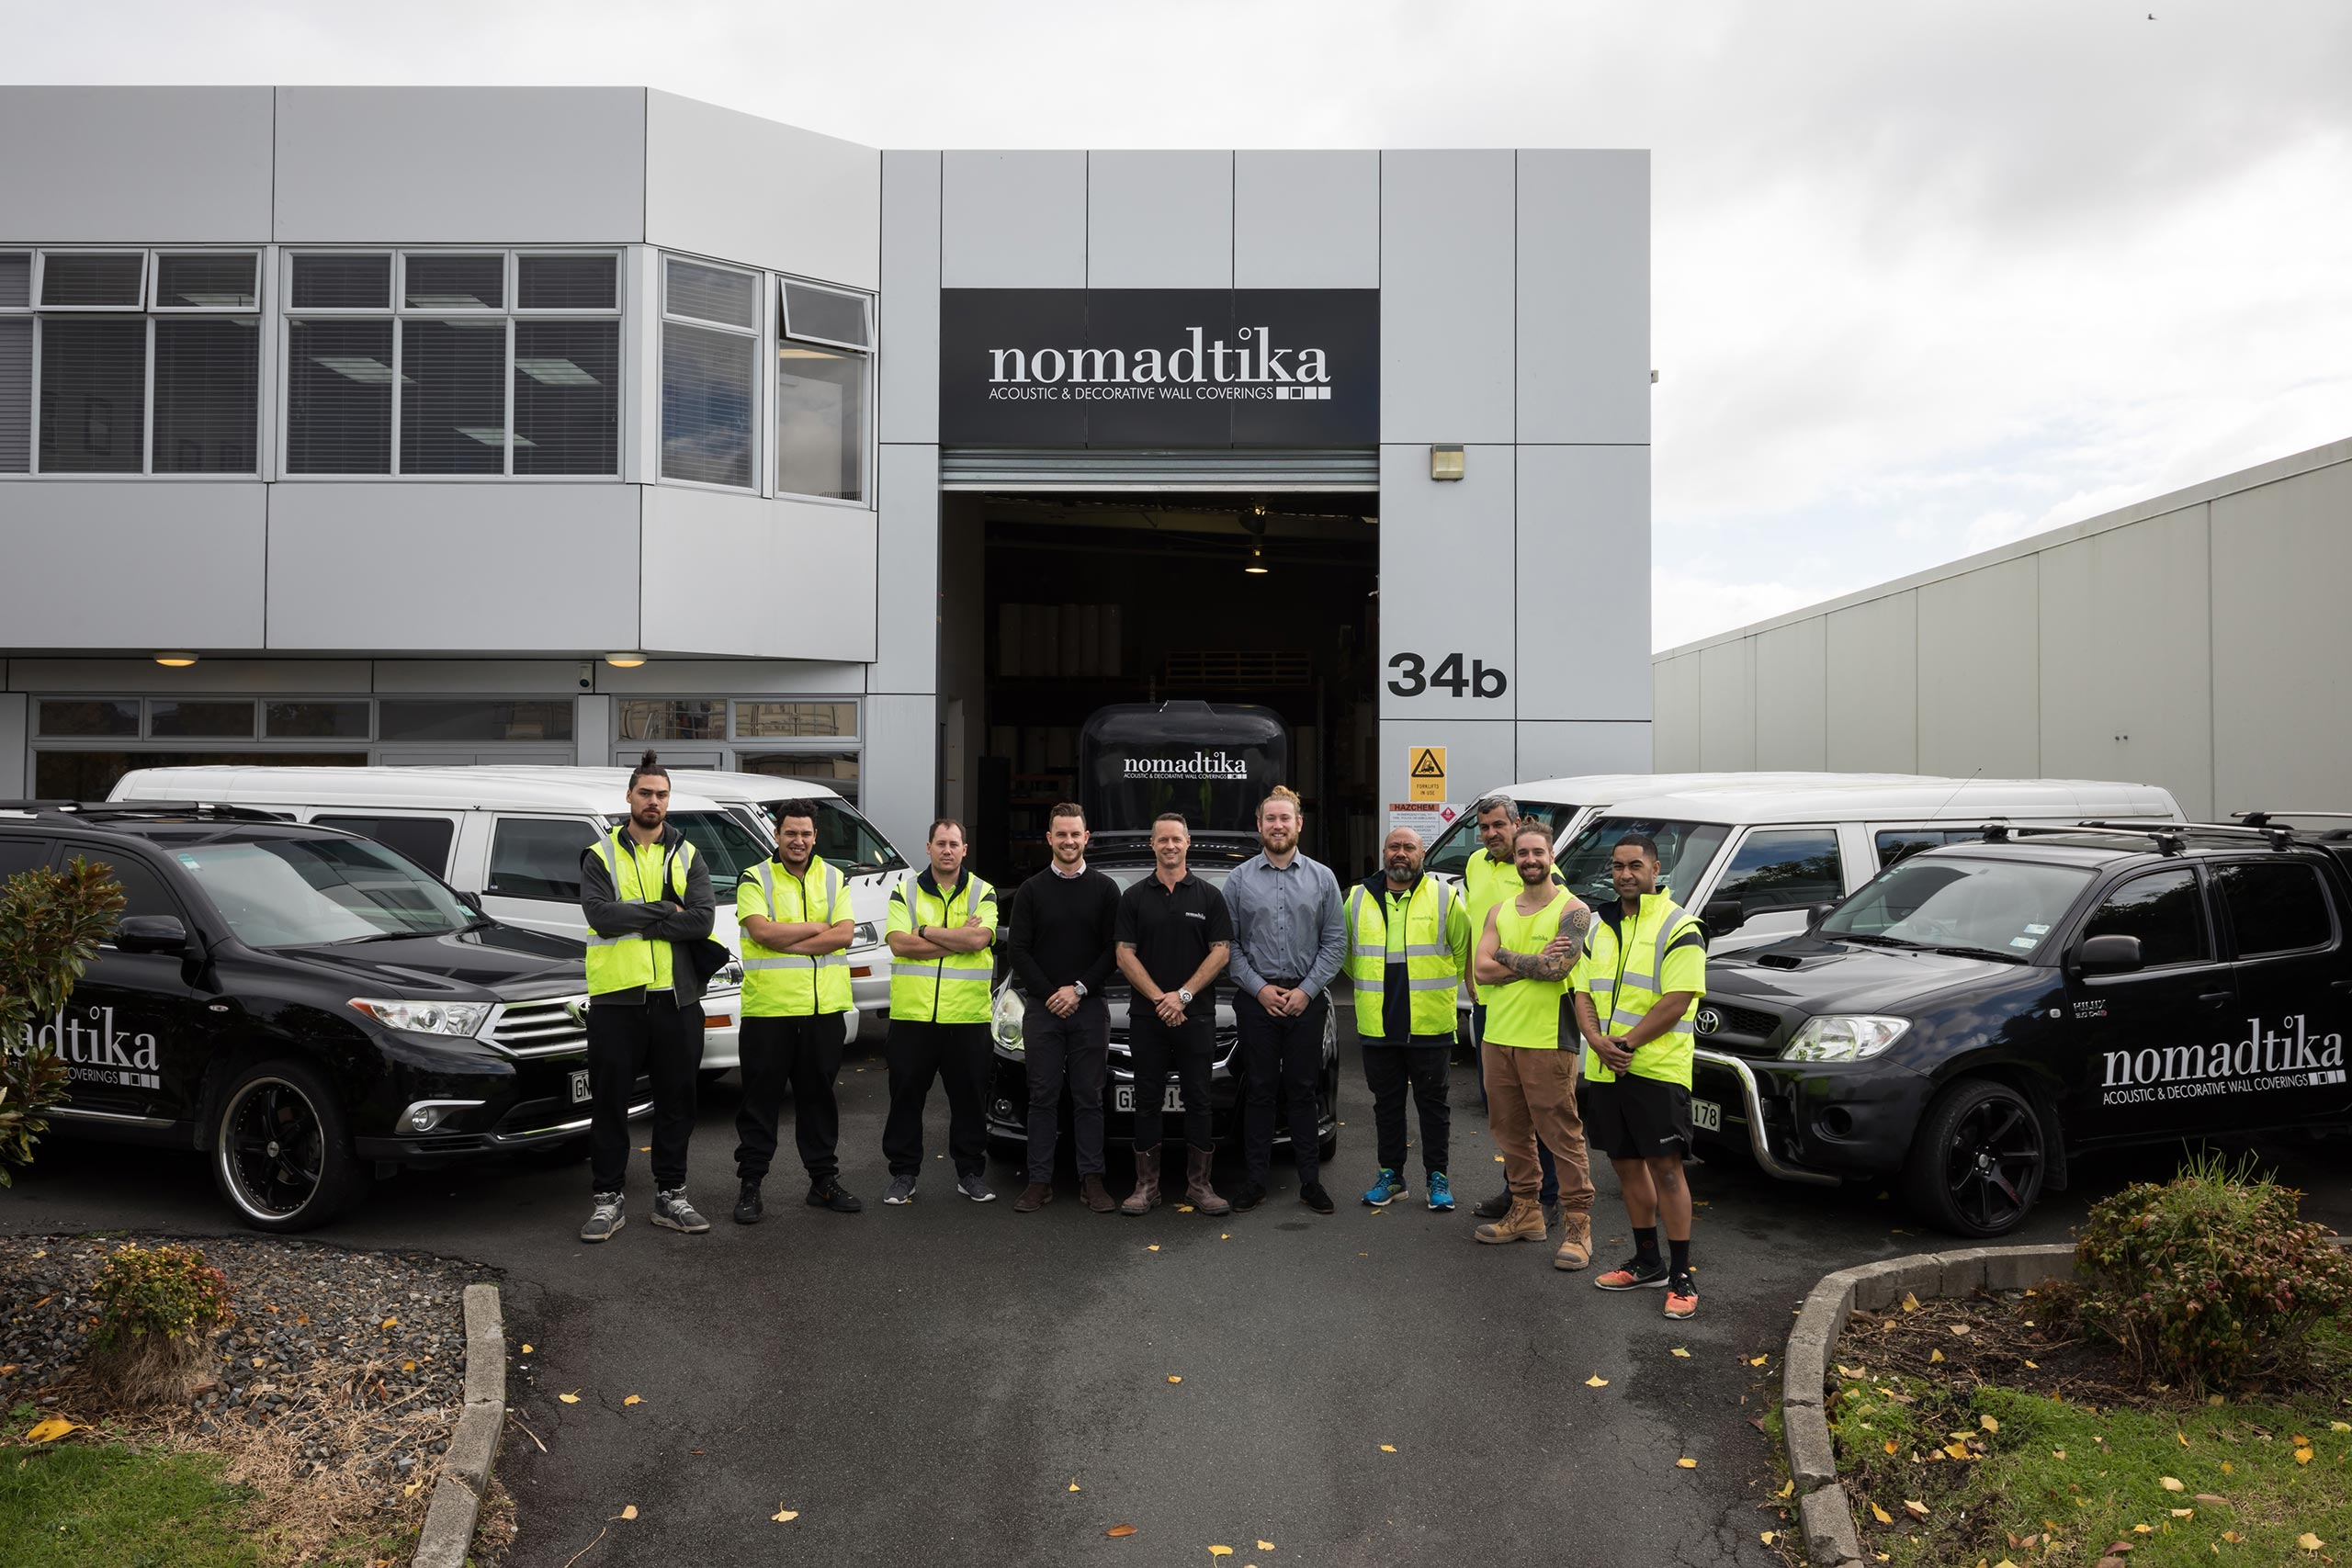 Nomadtika team